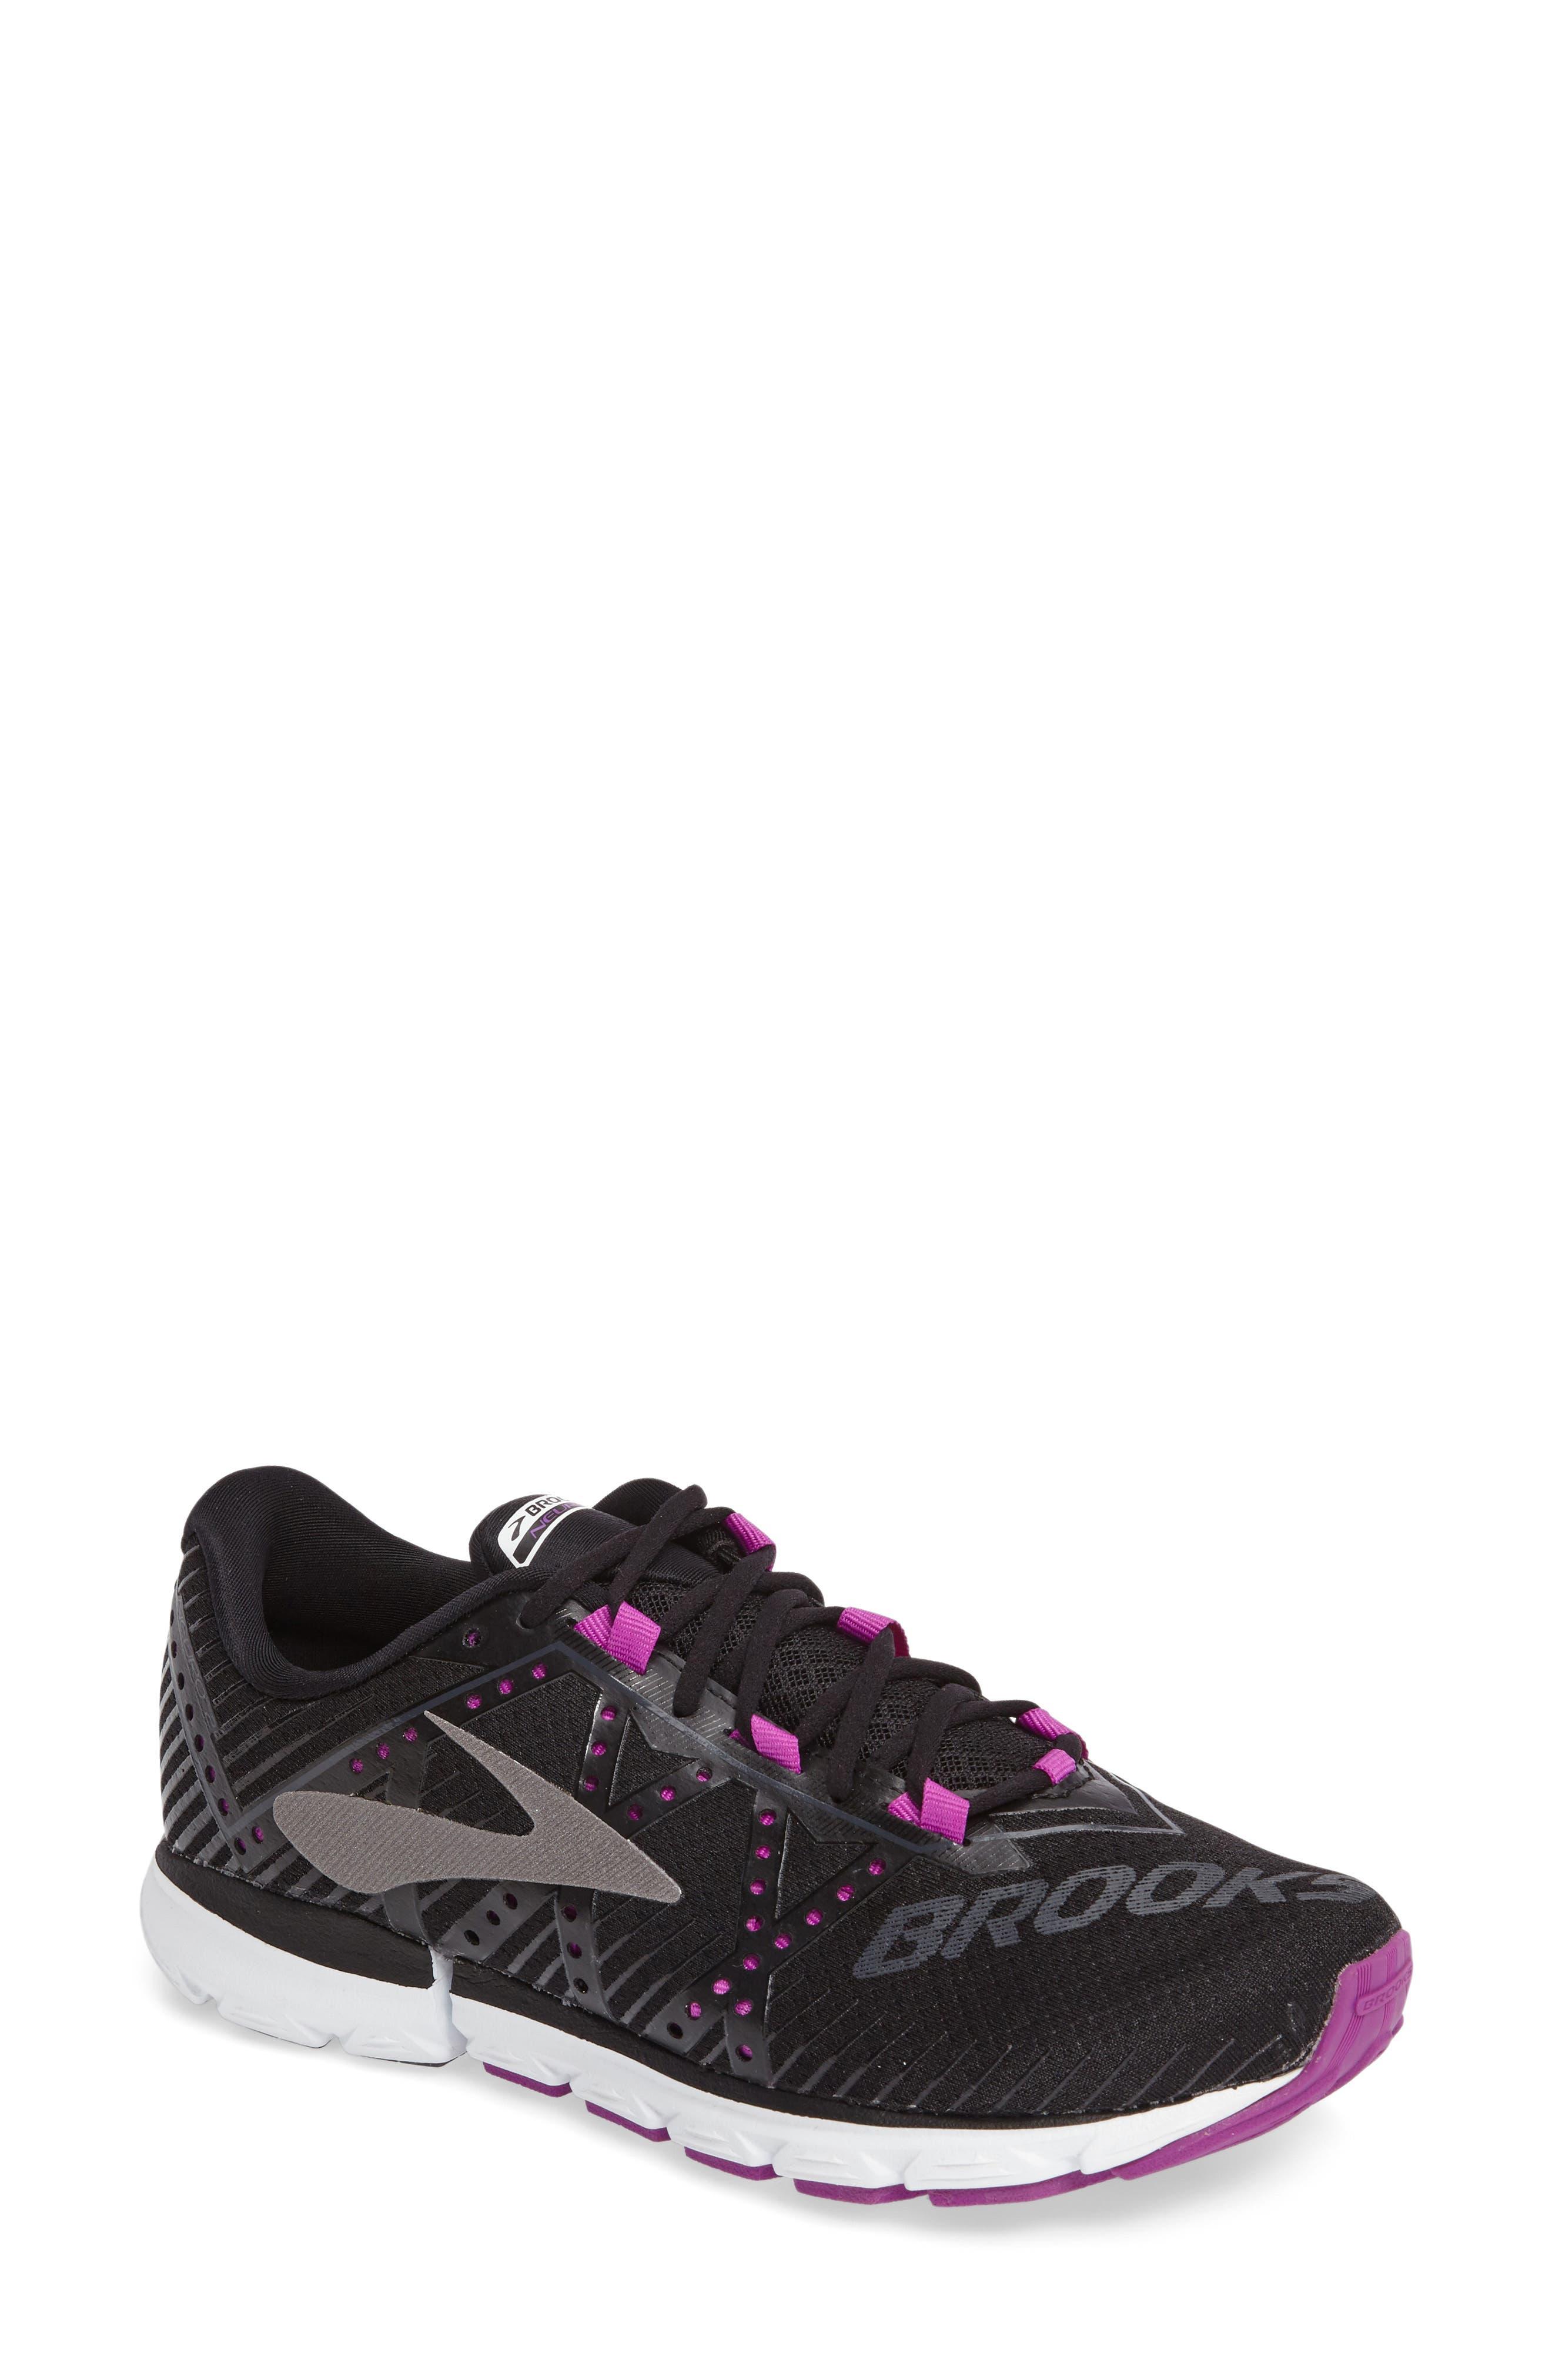 Neuro 2 Running Shoe,                         Main,                         color, 001